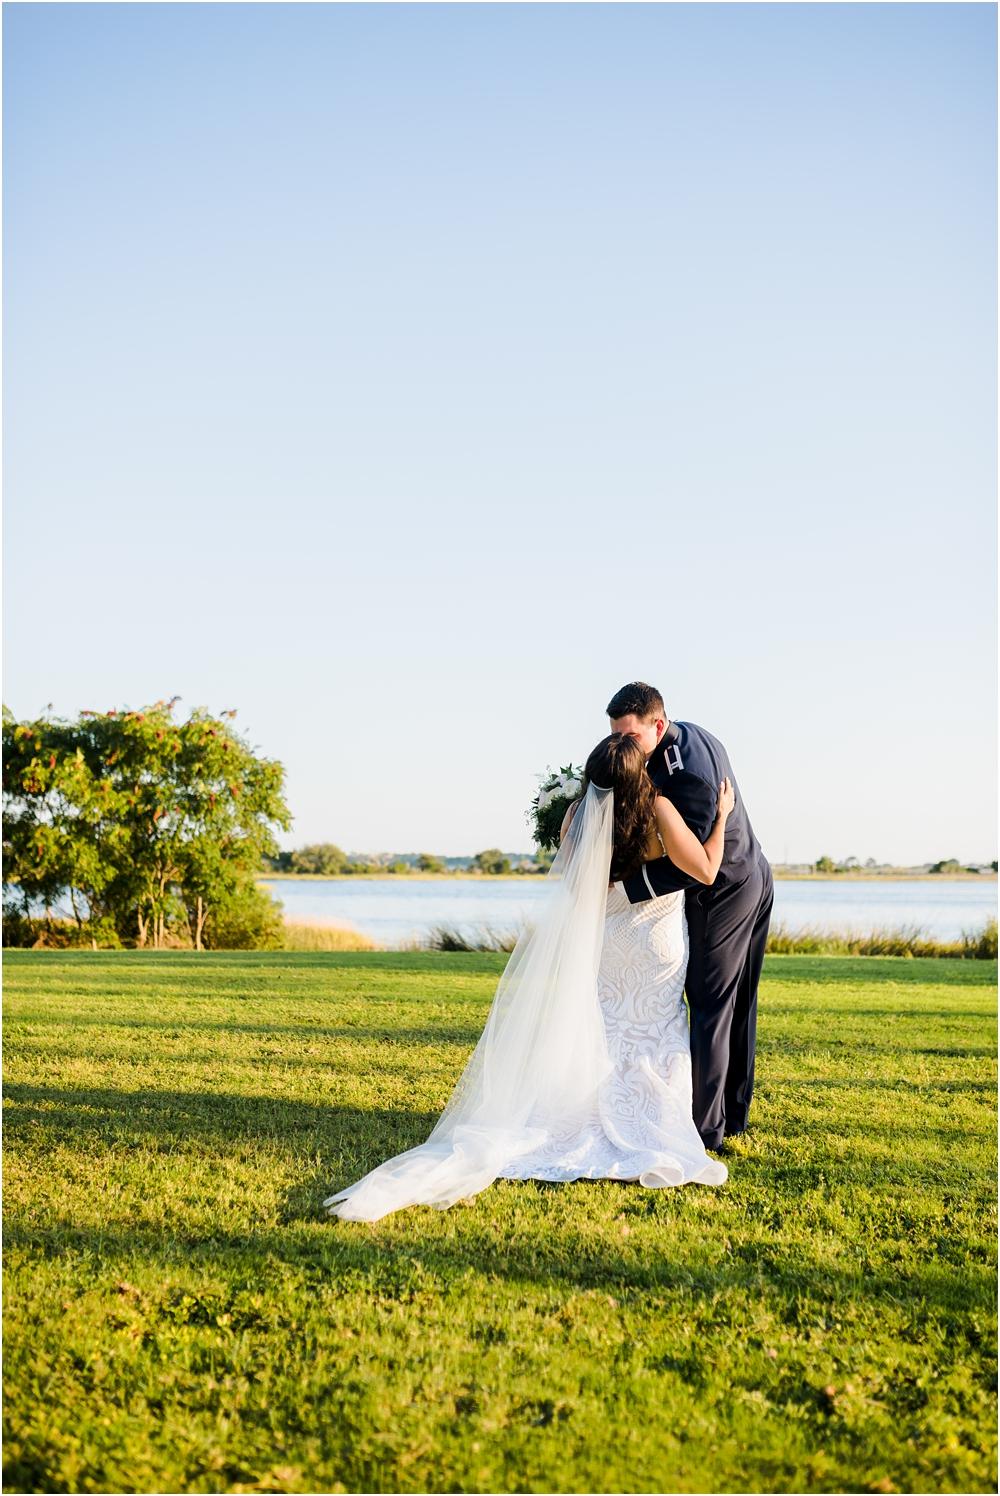 amack-wedding-kiersten-stevenson-photography-30a-panama-city-beach-dothan-tallahassee-(428-of-882).JPG